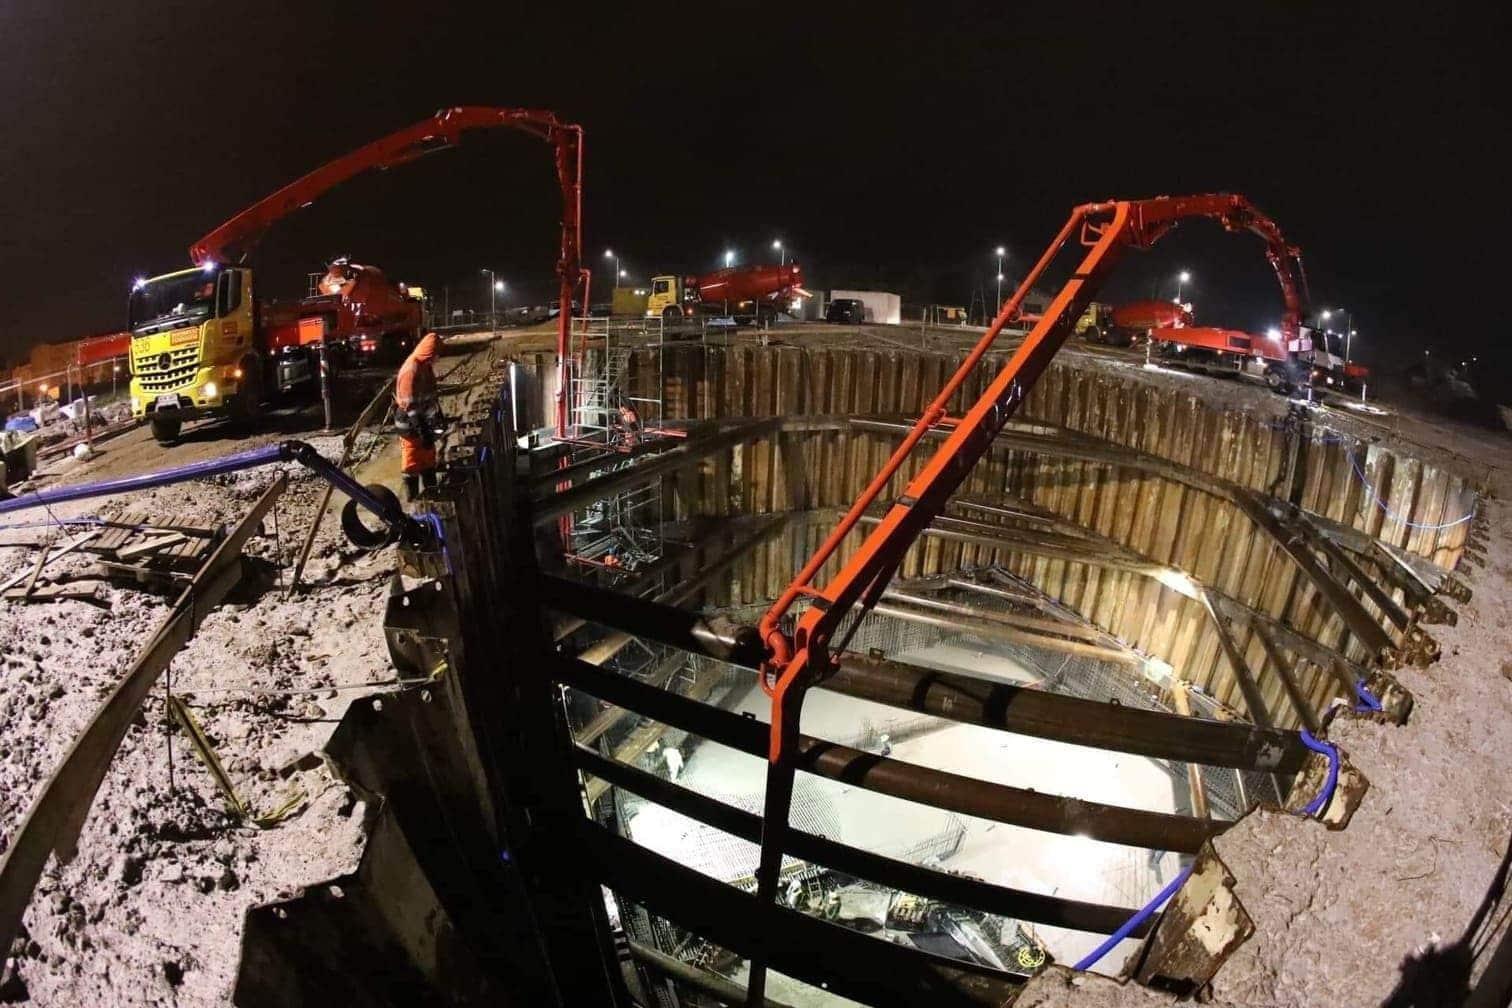 <p>Die Bauarbeiten haben bereits begonnen...</p> Foto: Deepspot